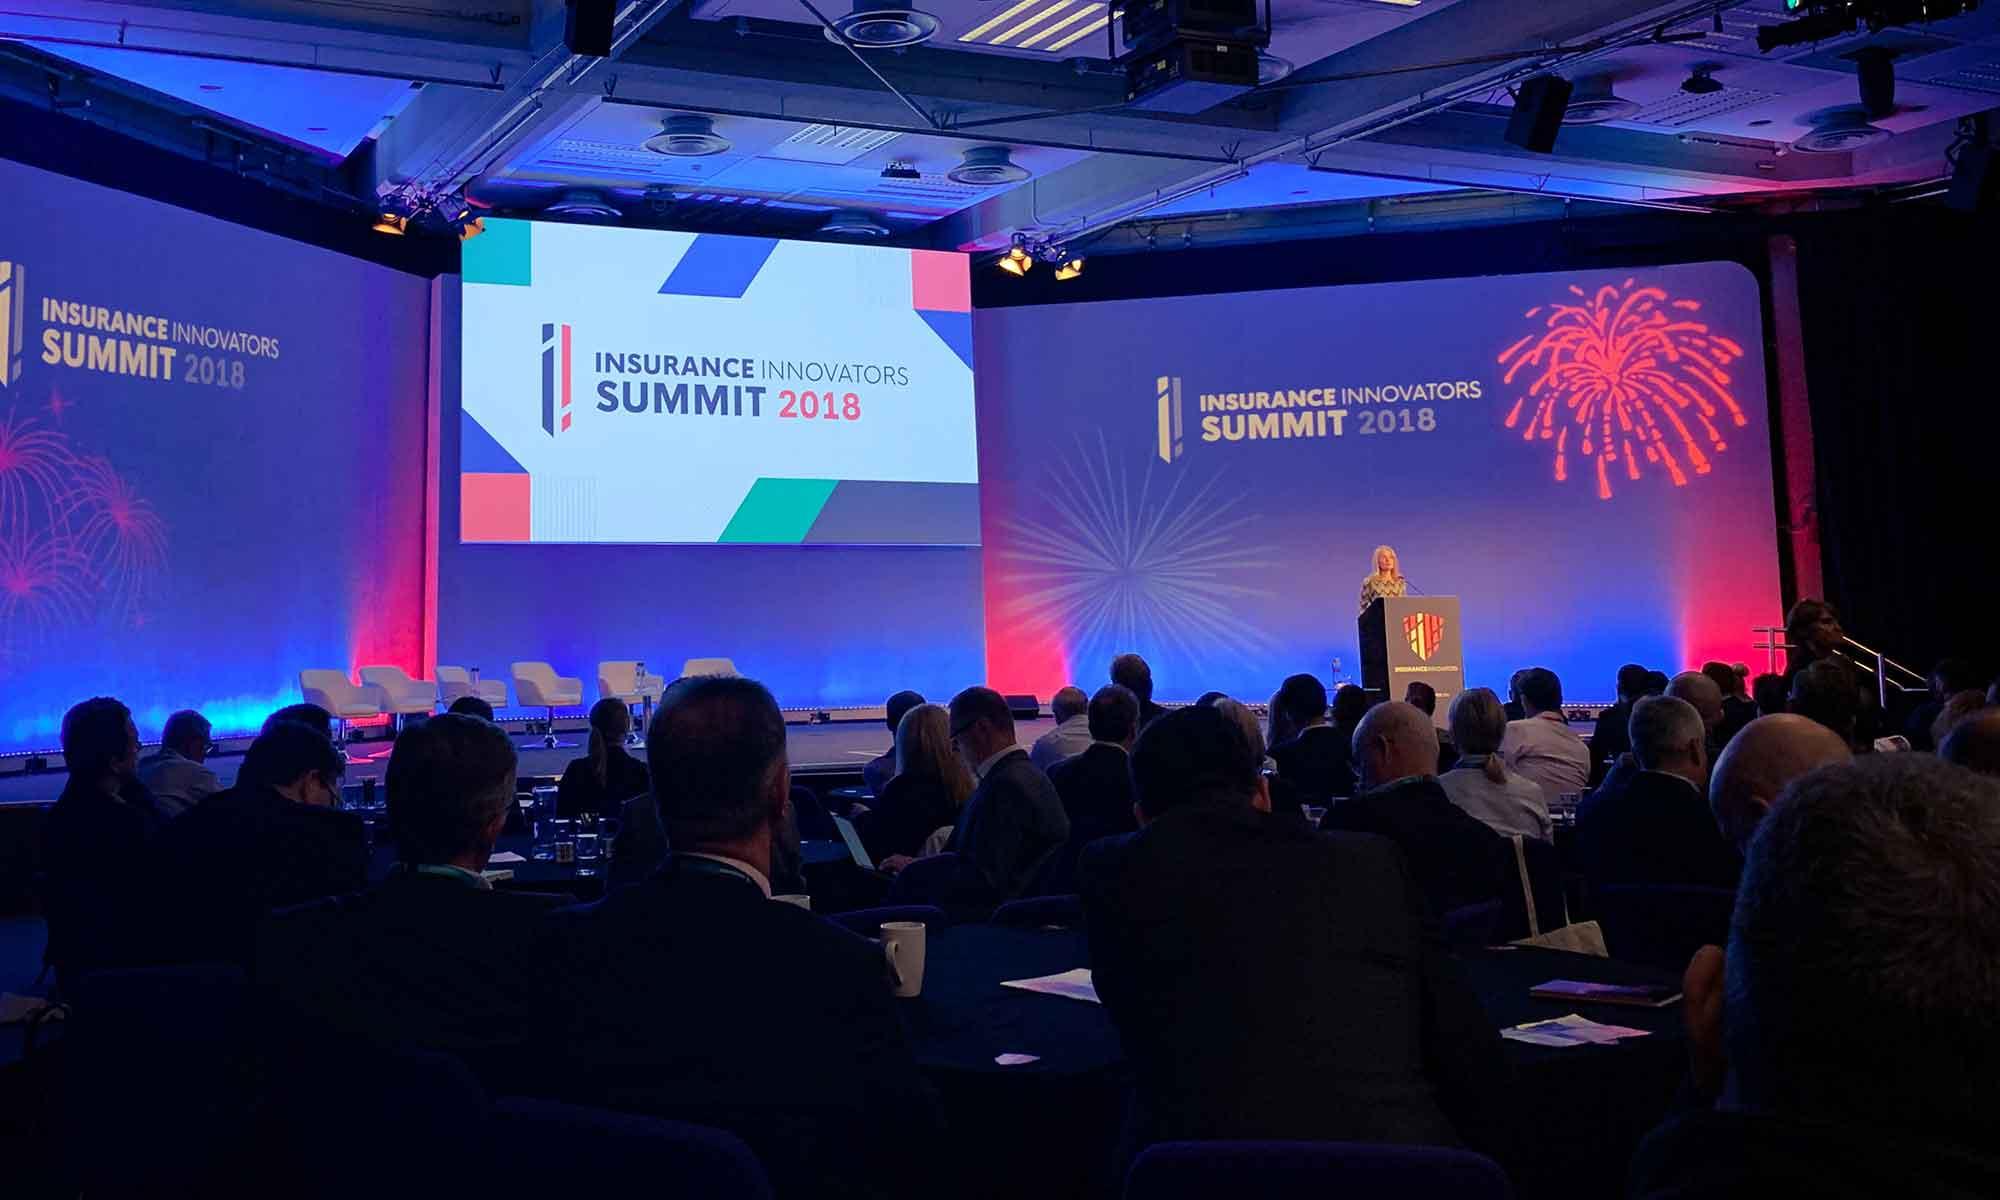 bsurance Insurance Innovators Summit 2018